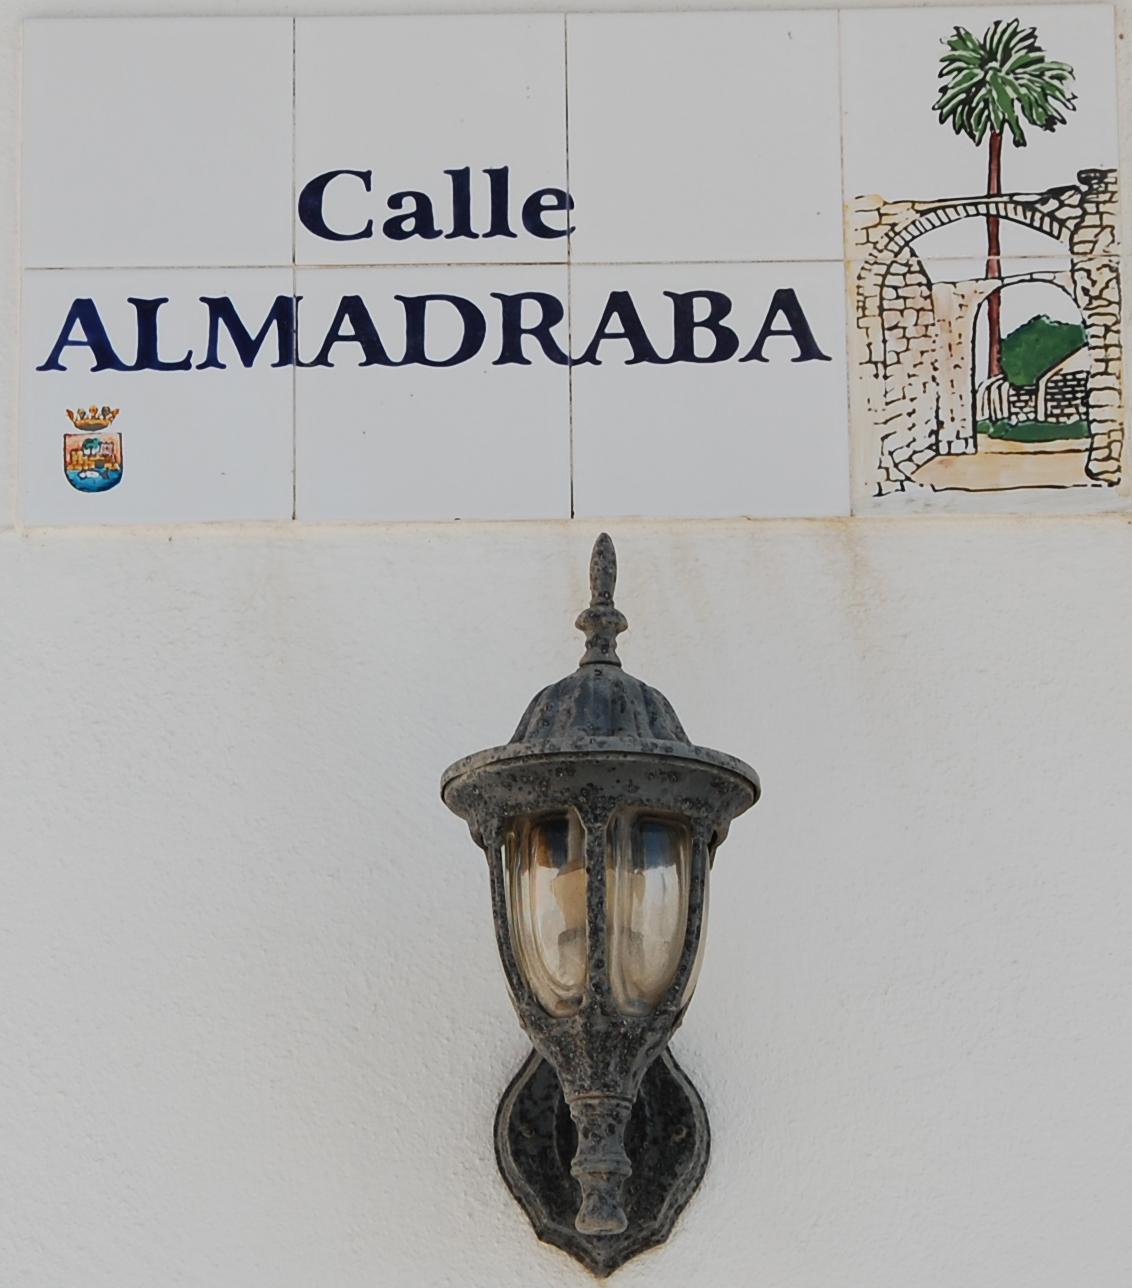 almadraba-tuna-cadiz